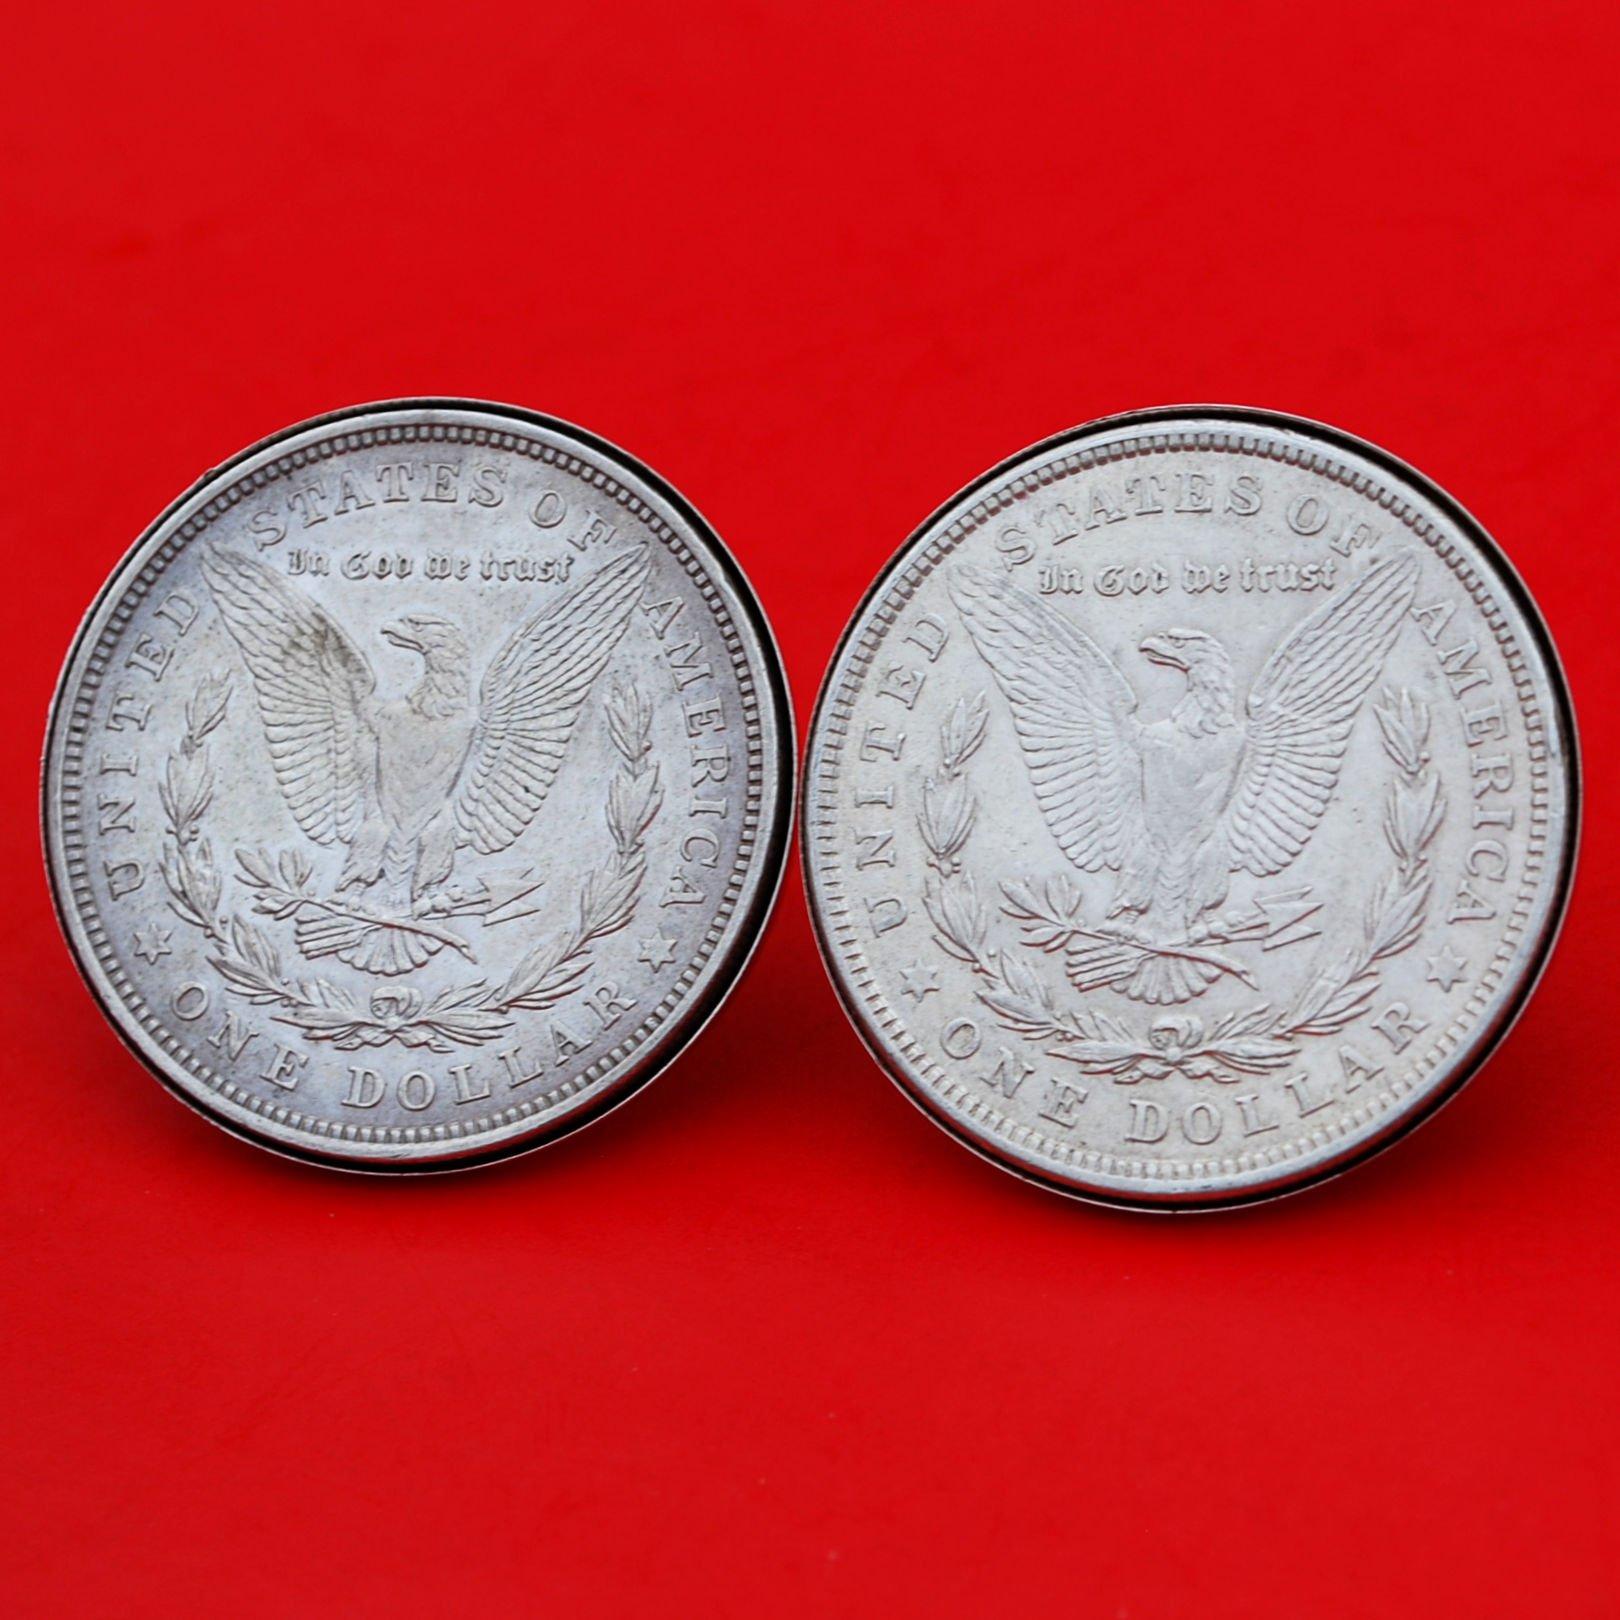 US 1921 Morgan Silver Dollar Silver Cufflinks NEW - REVERSE + REVERSE